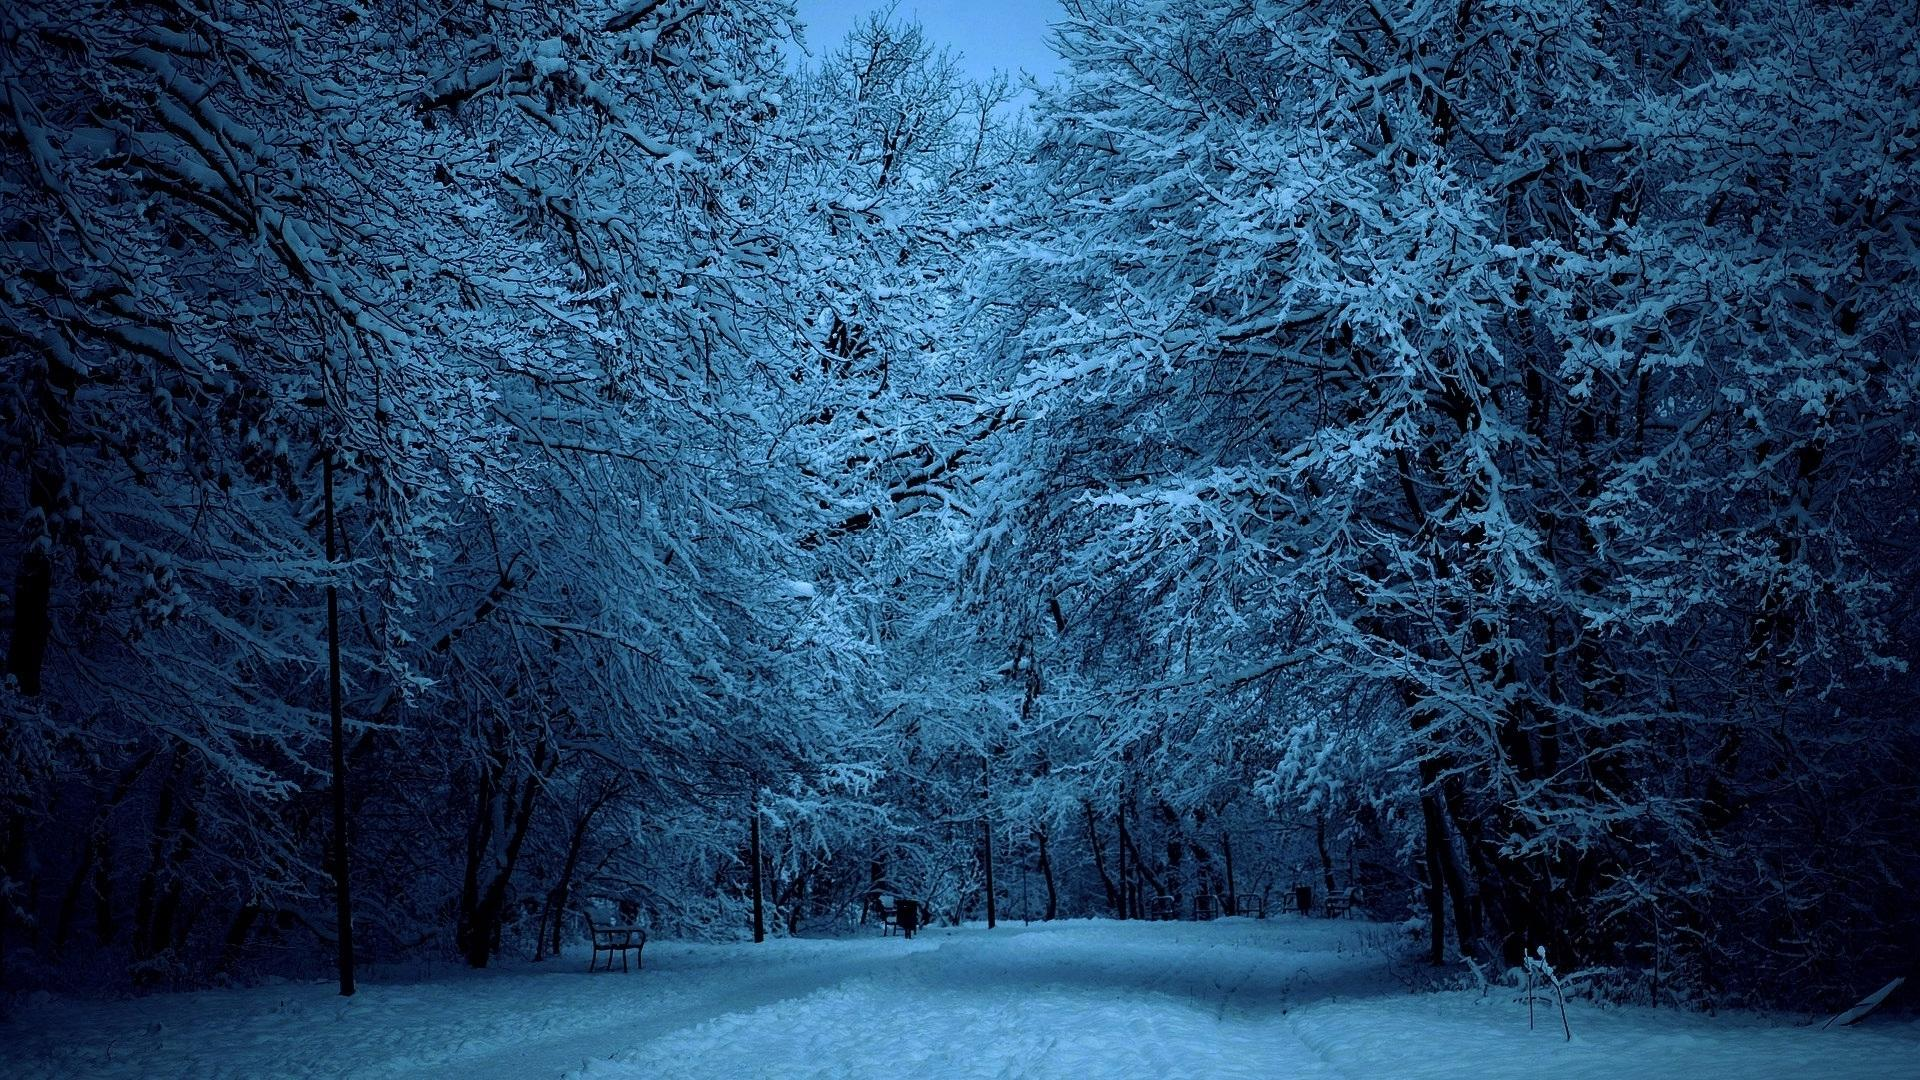 Nature Winter Tree Snow Snowy trees HD Wallpapers Desktop 1920x1080